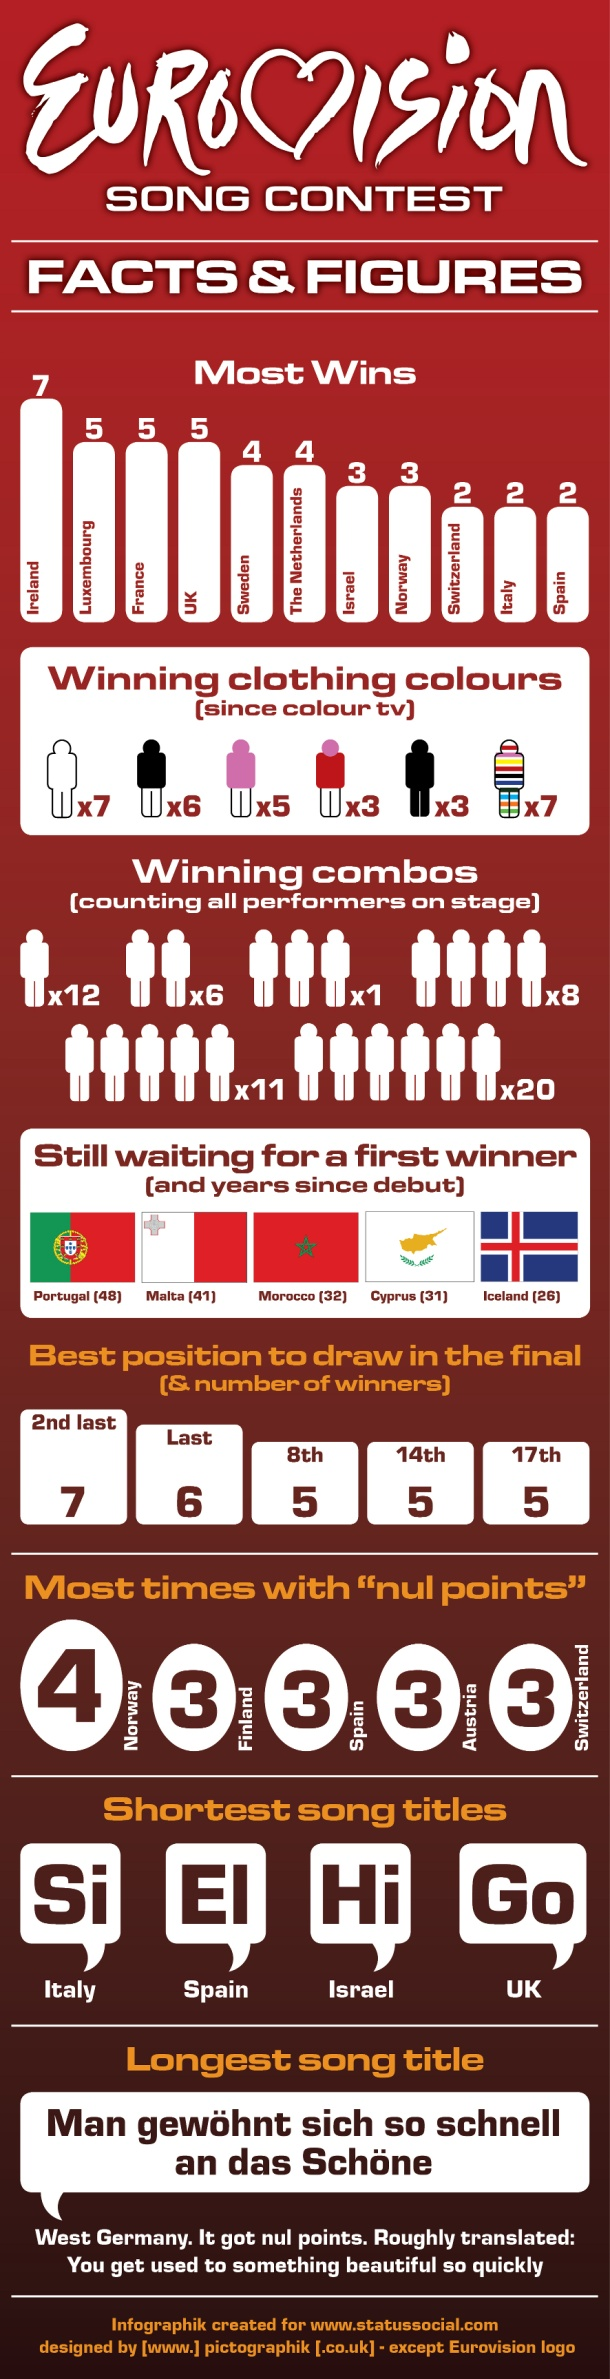 EurovisionSongContestFactsFigures_4fb524f6d9628